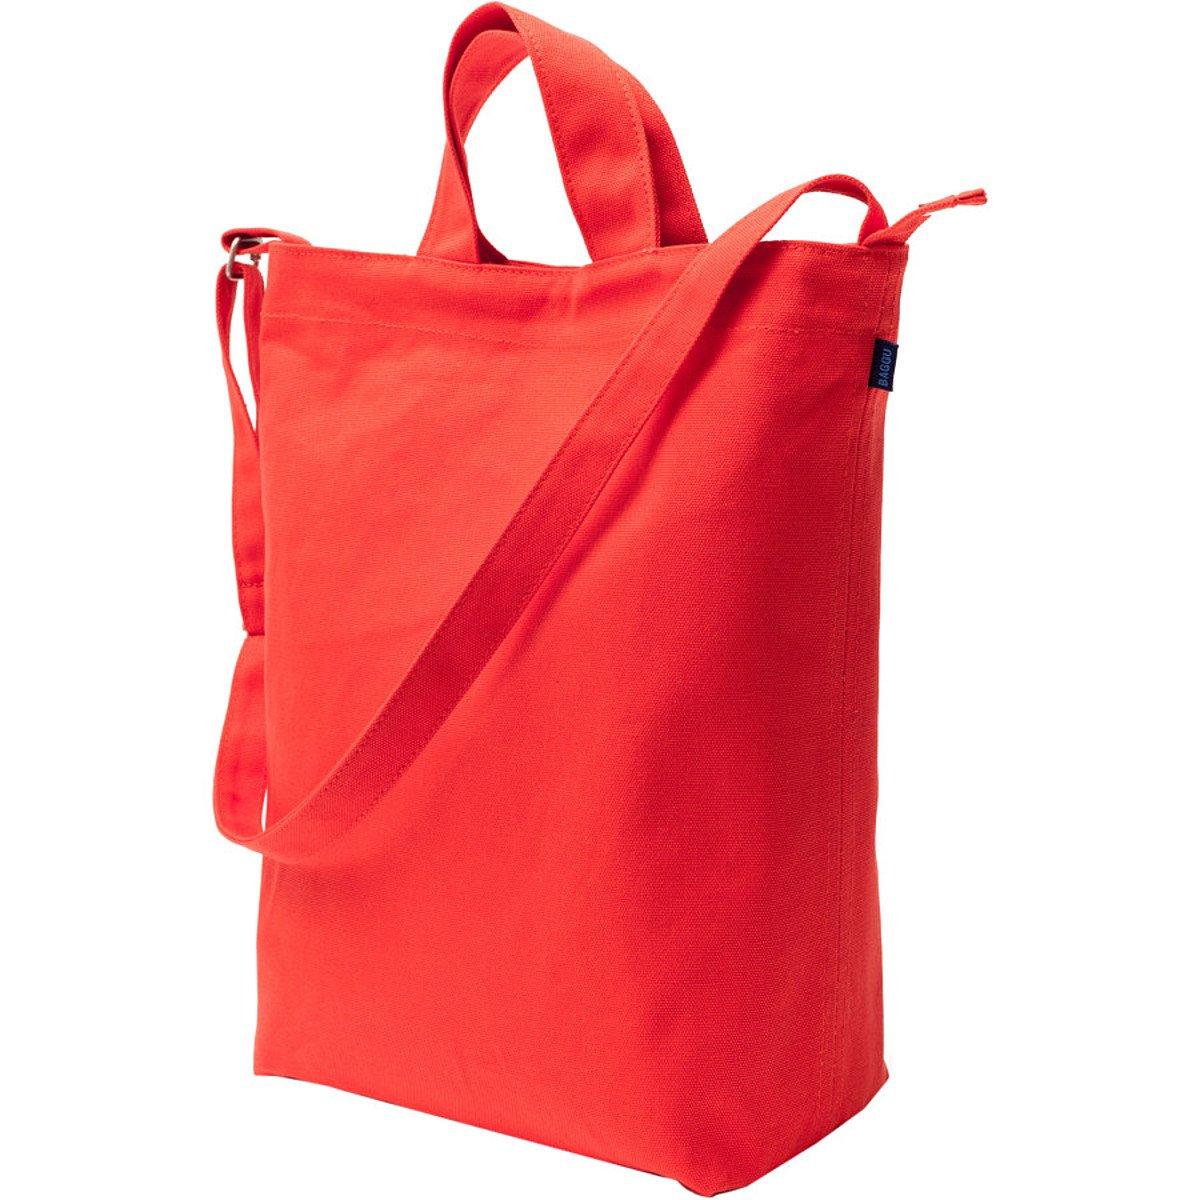 BAGGU Duck Bag キャンバストート One Size 852660996366 B00D5YDM8K ポピー ポピー